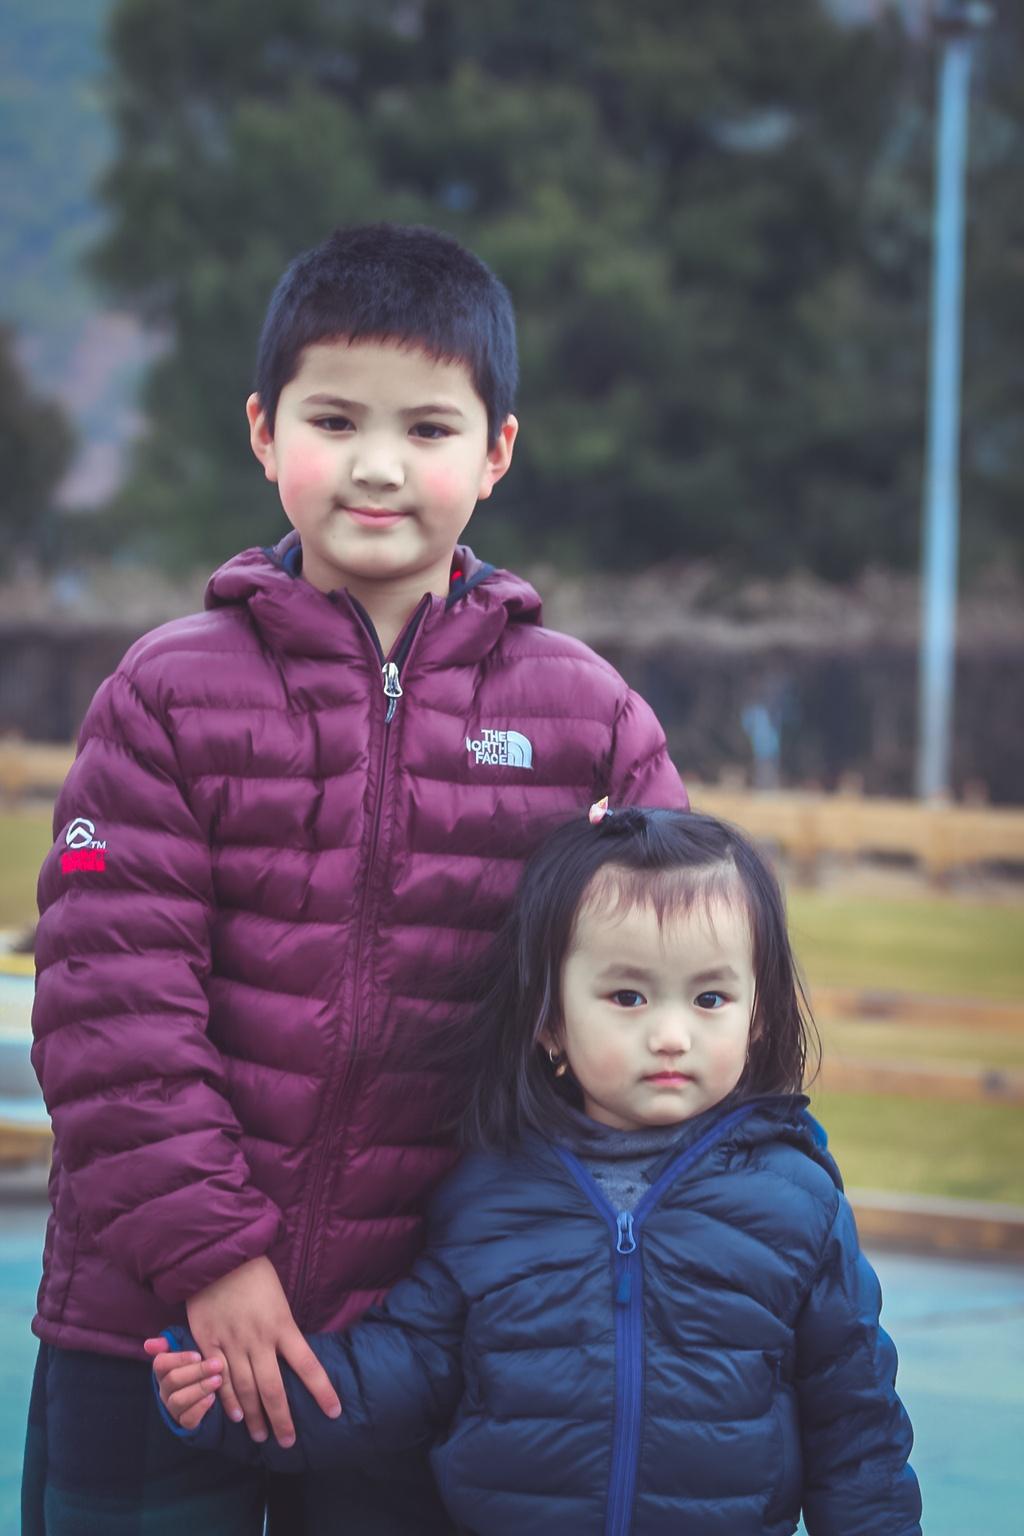 Bhutan, quoc gia binh tinh song giua dai dich virus corona hinh anh 9 IMG_4222.jpg